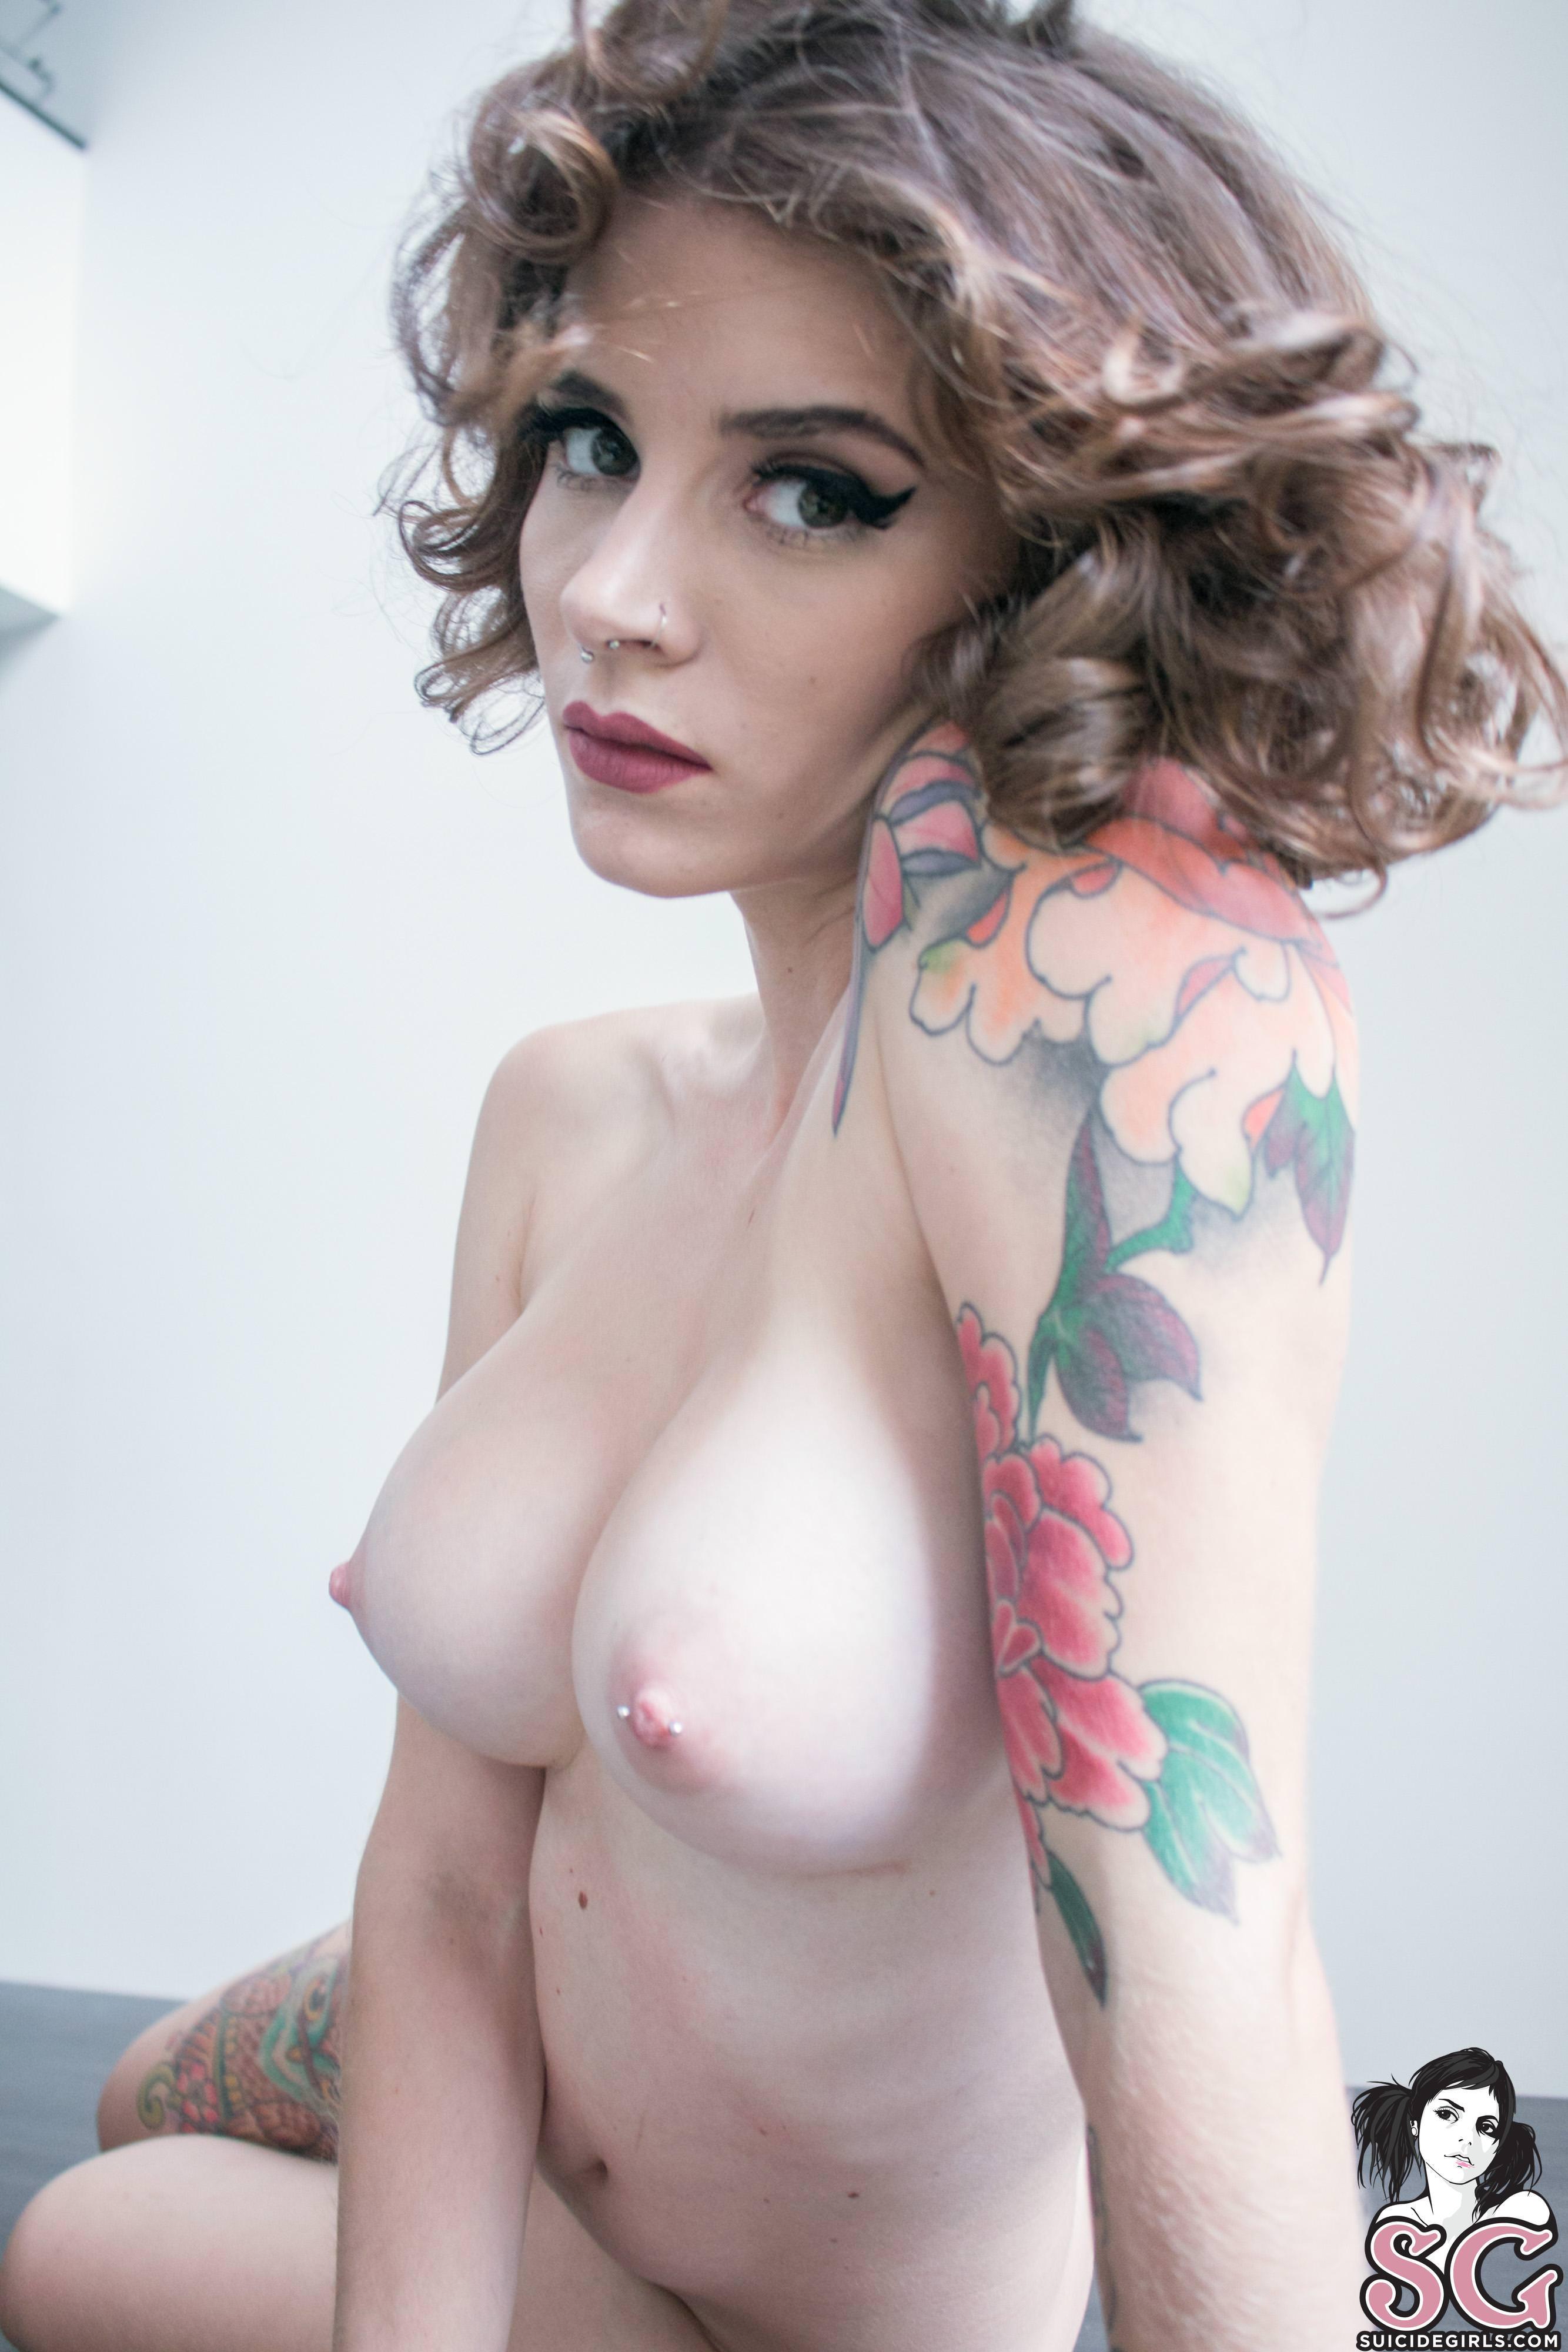 Nude sports women pics